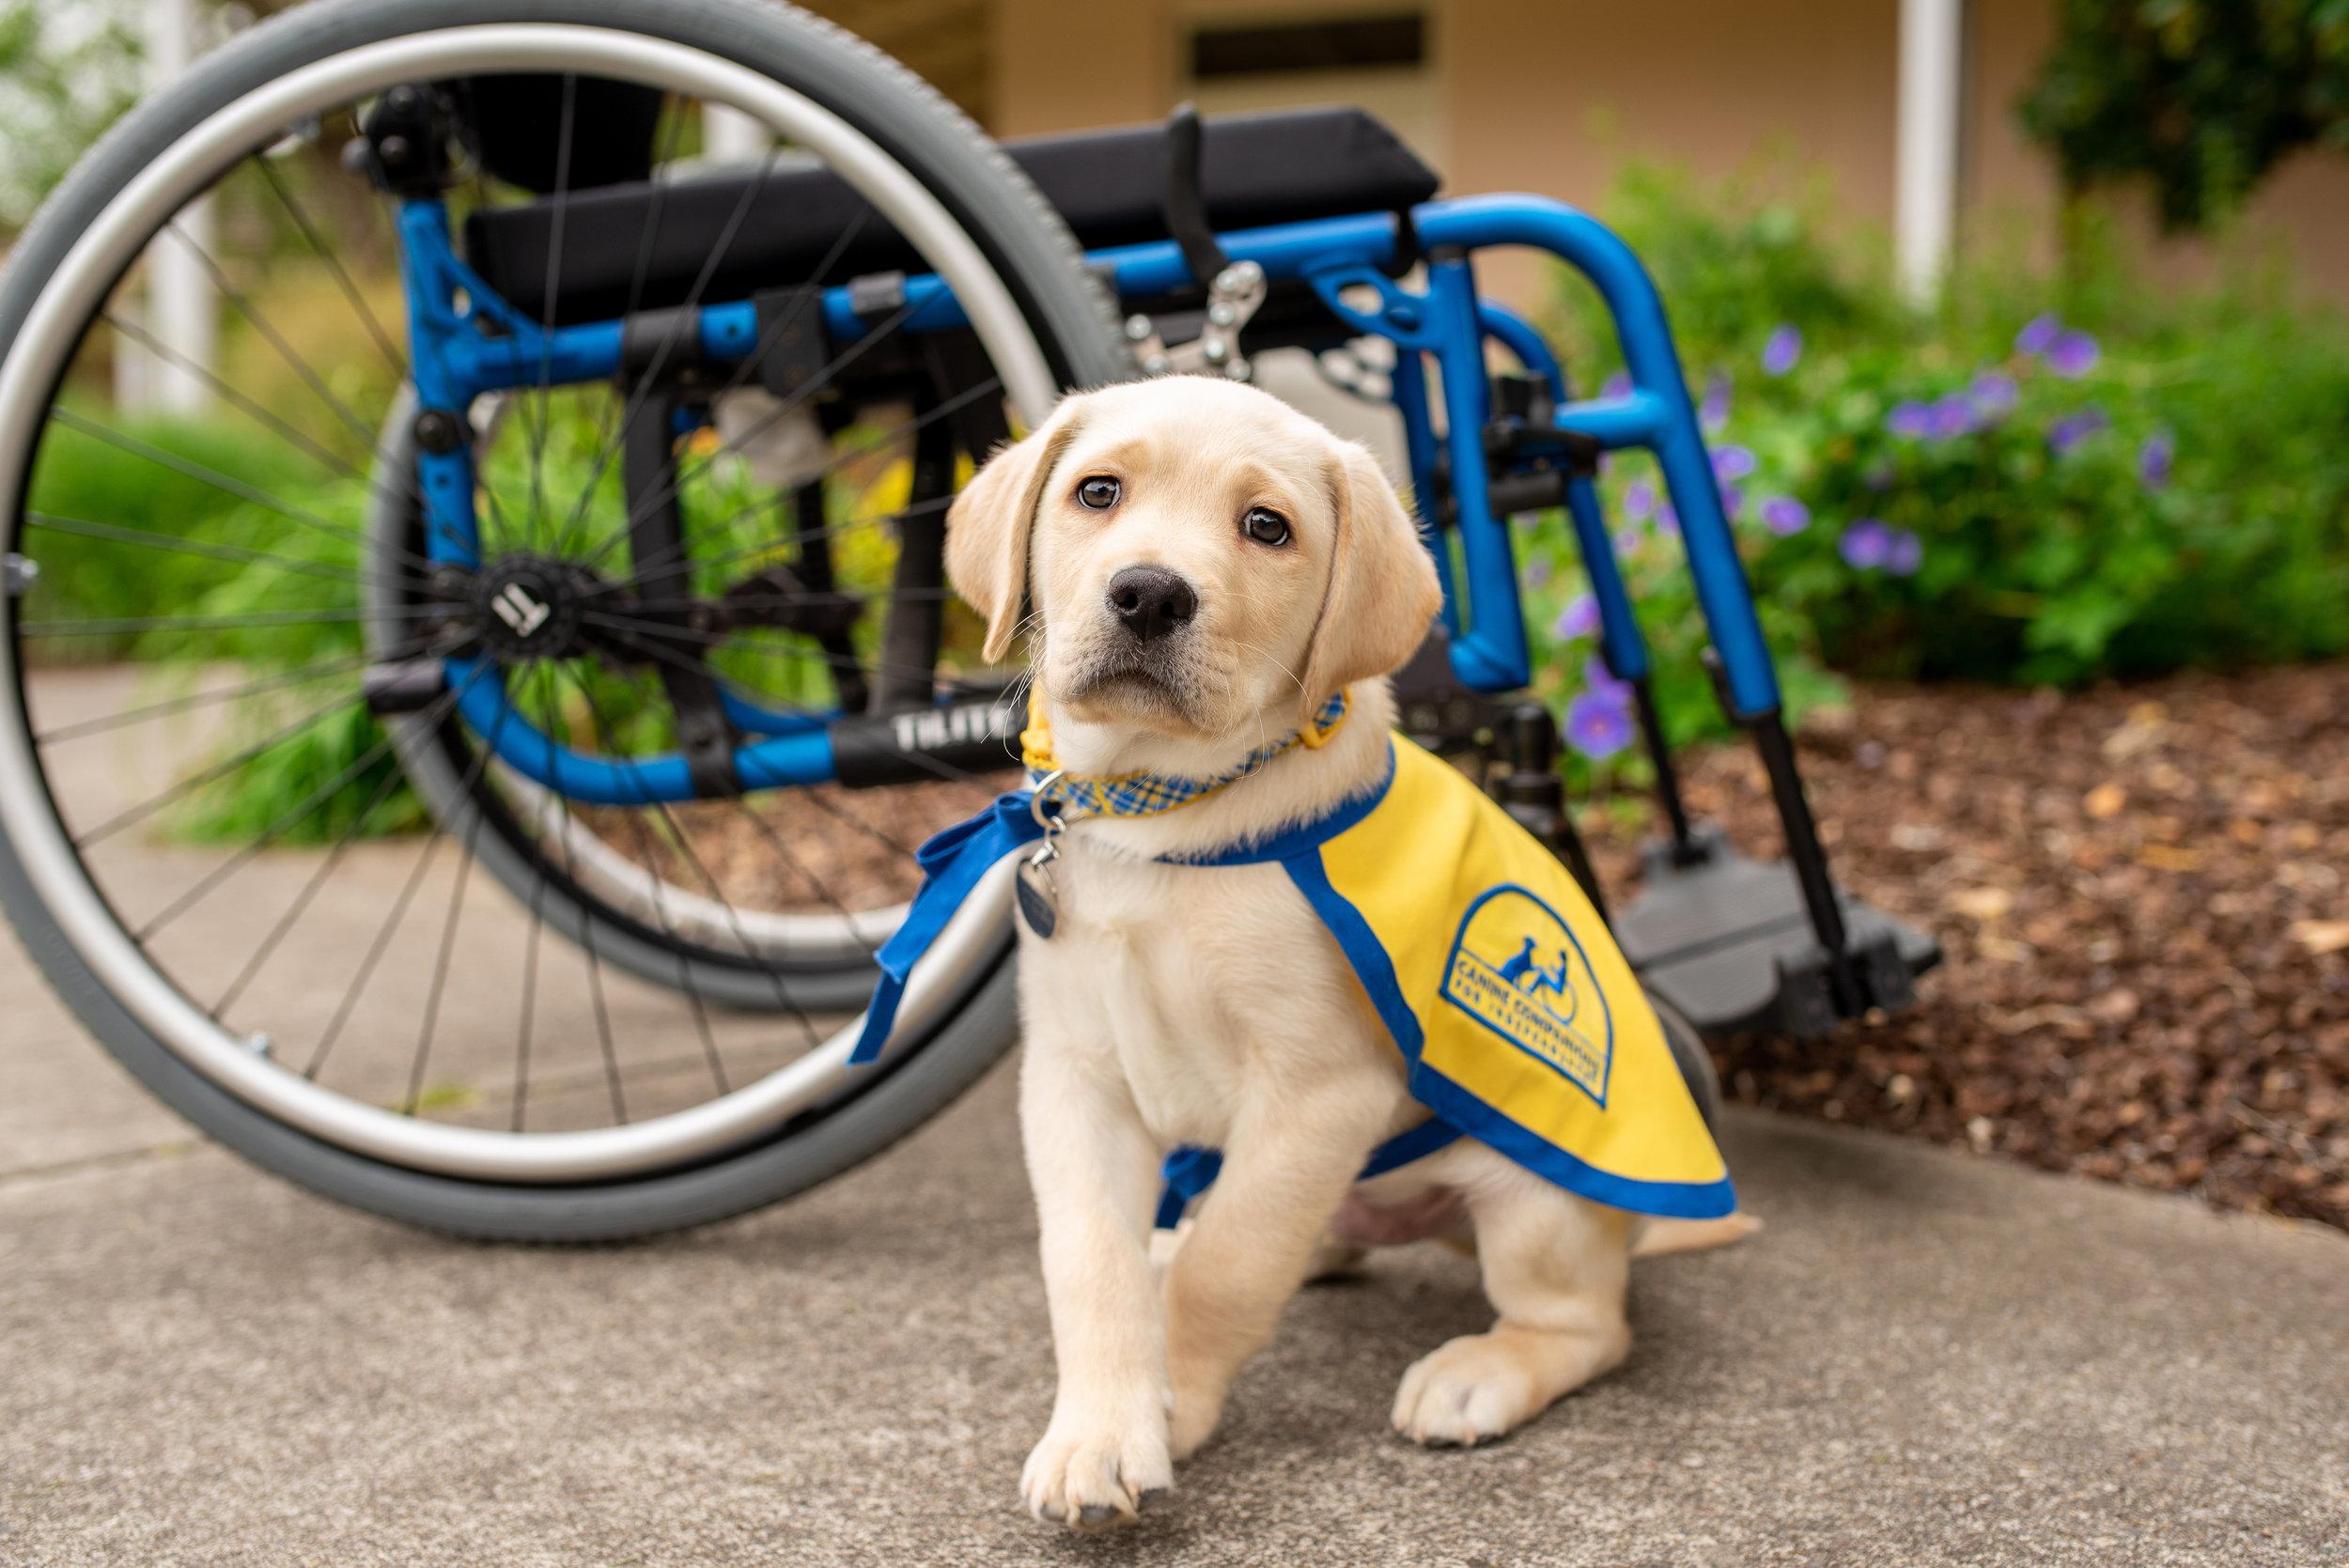 01 Post July 30  TUE x70-Phil.Wilt.Handicapp_Assistant.2019-DSC_2030.jpg